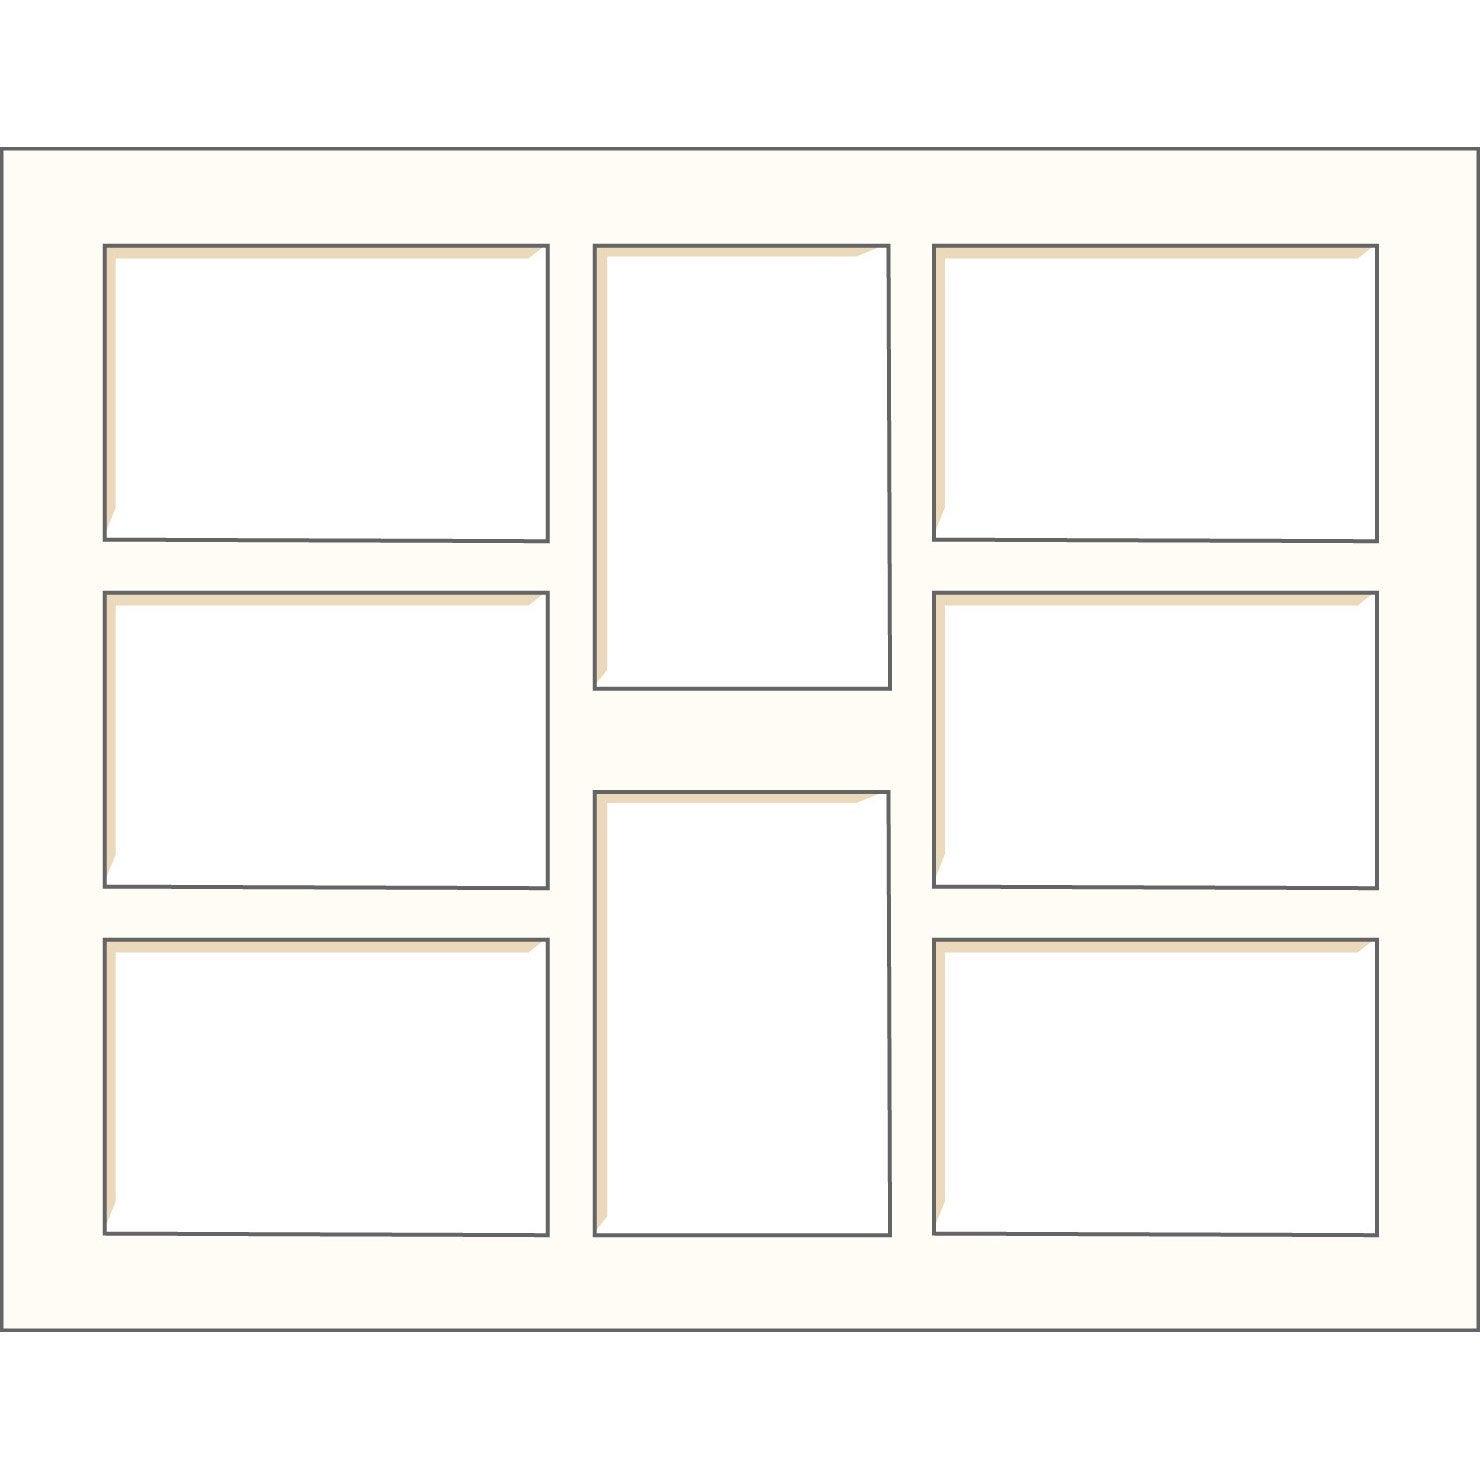 passe partout 40x50 cm blanc cass leroy merlin. Black Bedroom Furniture Sets. Home Design Ideas